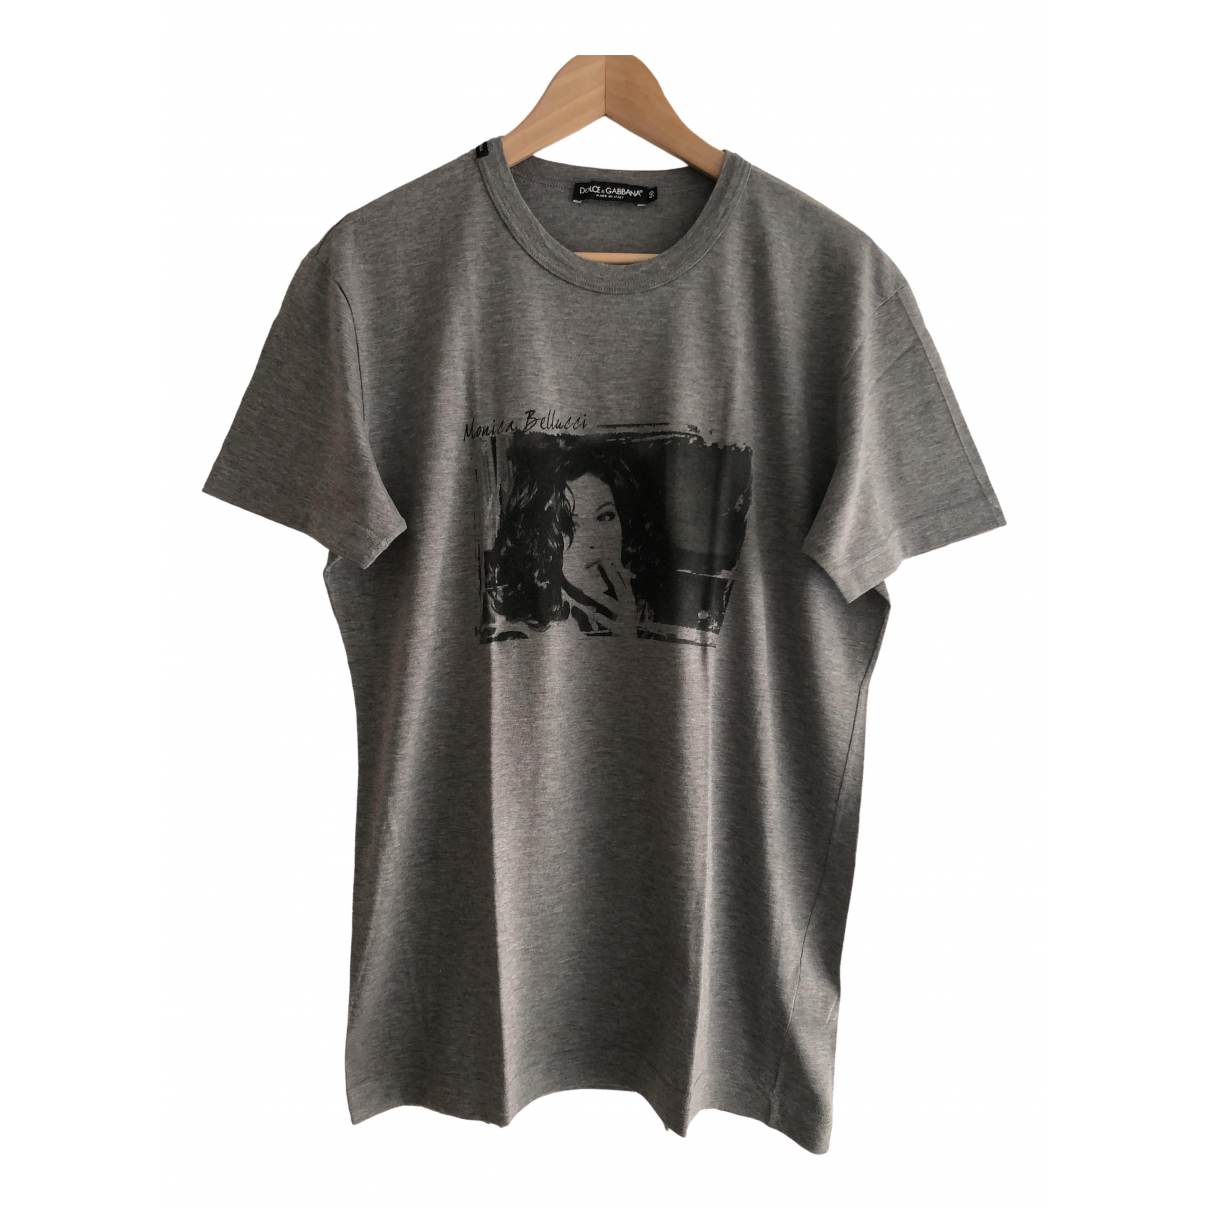 Dolce & Gabbana - Tee shirts   pour homme en coton - anthracite